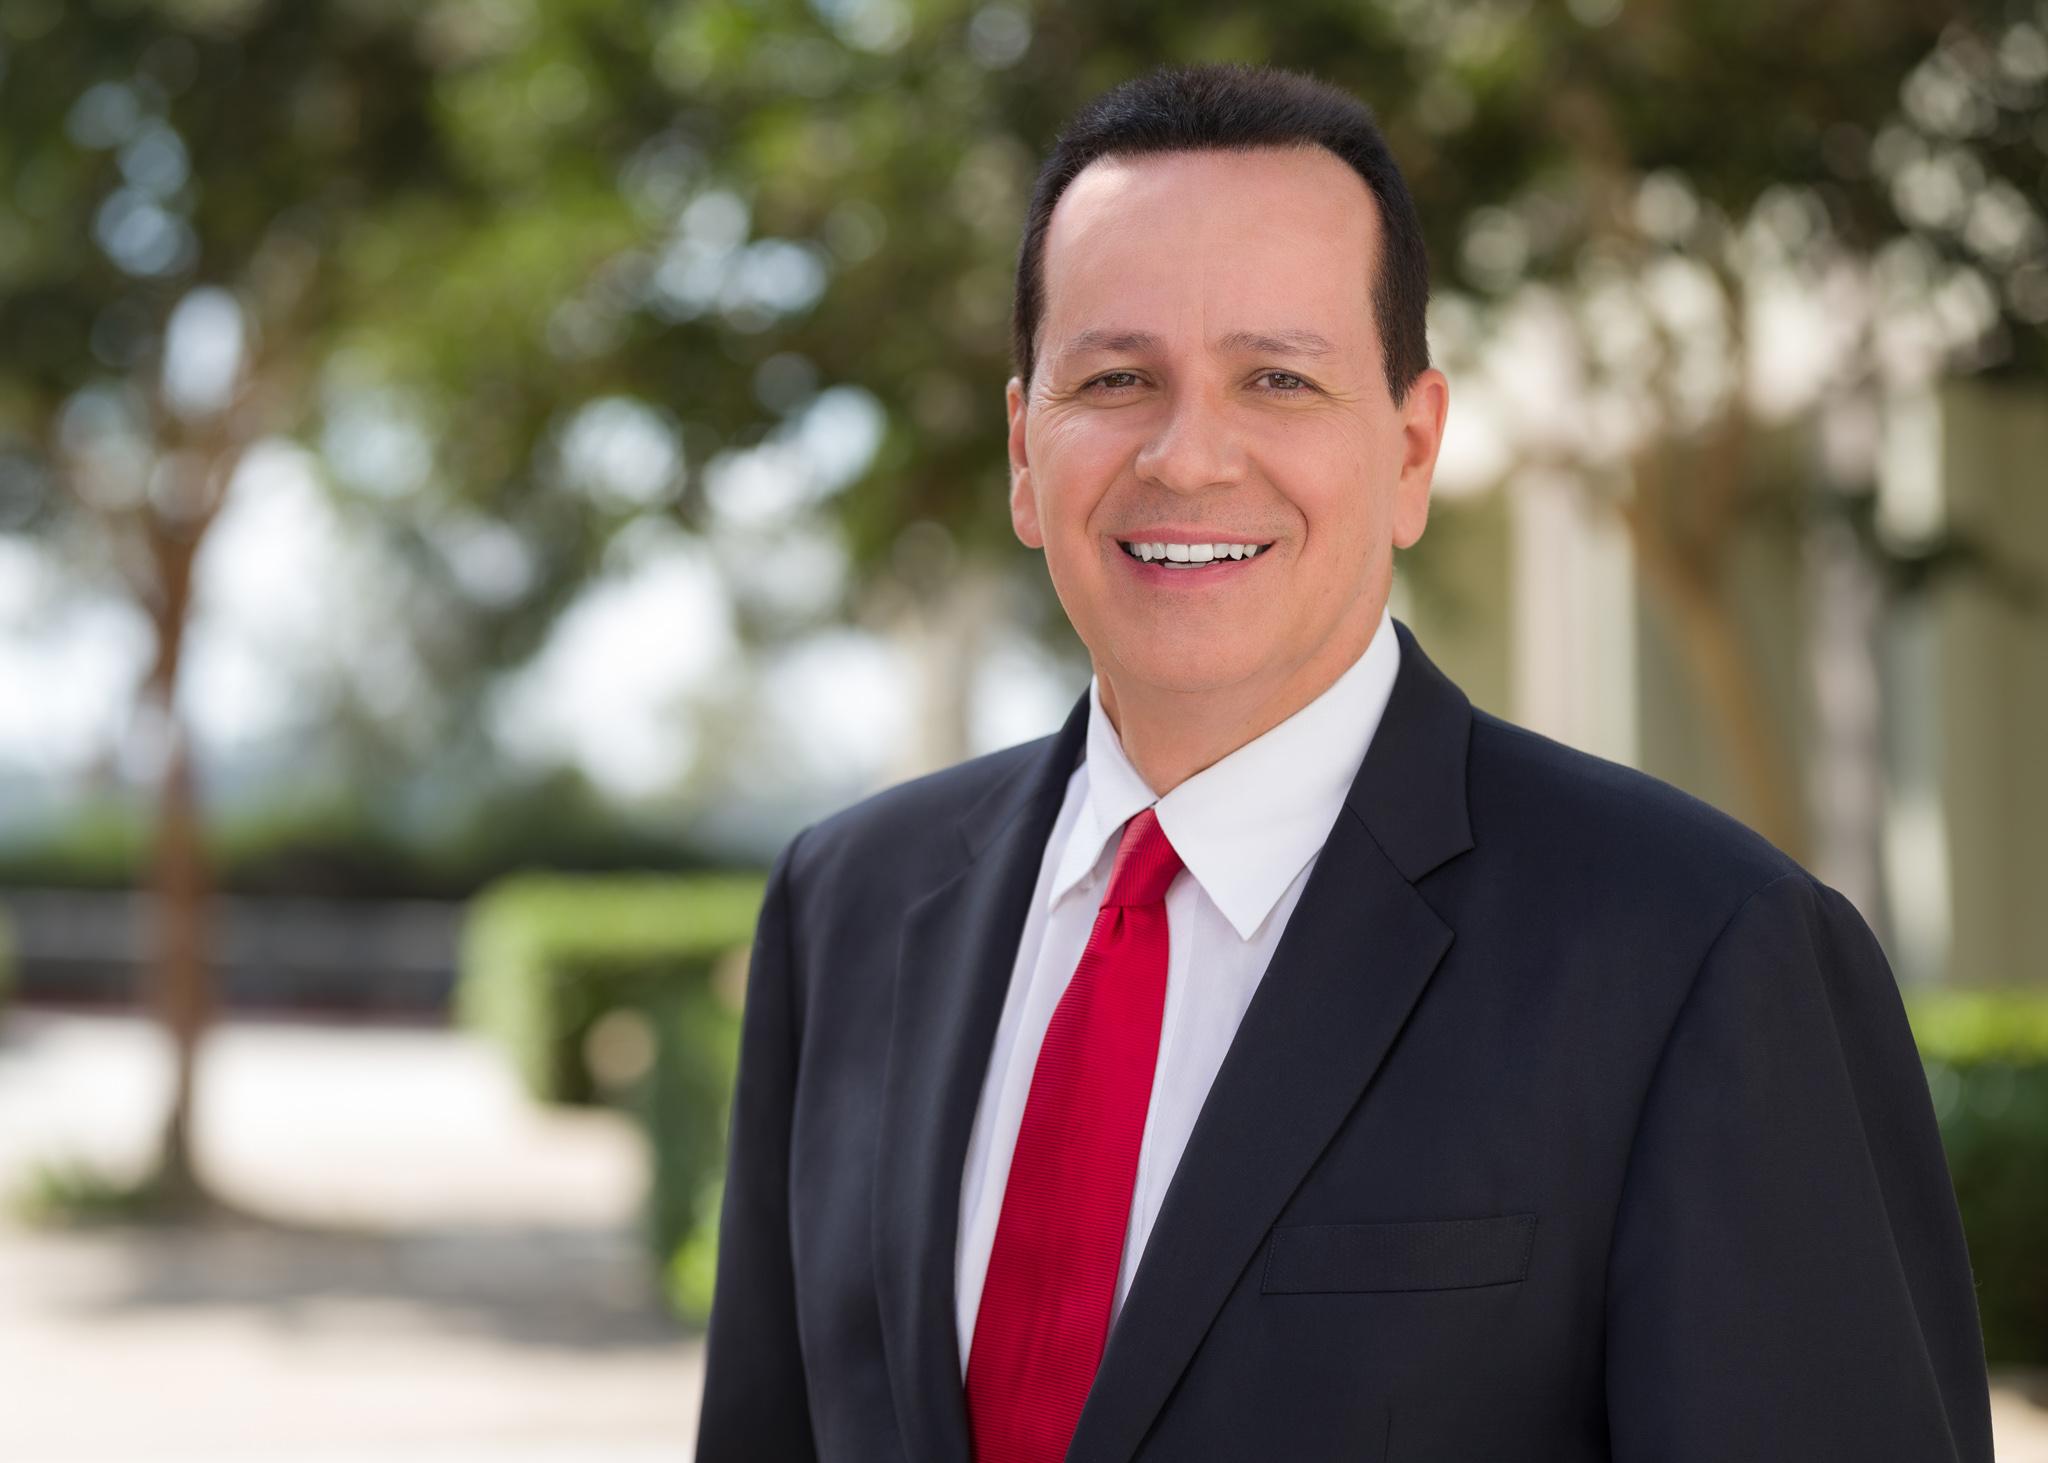 Craig Barkacs, business law professor at the USD School of Business